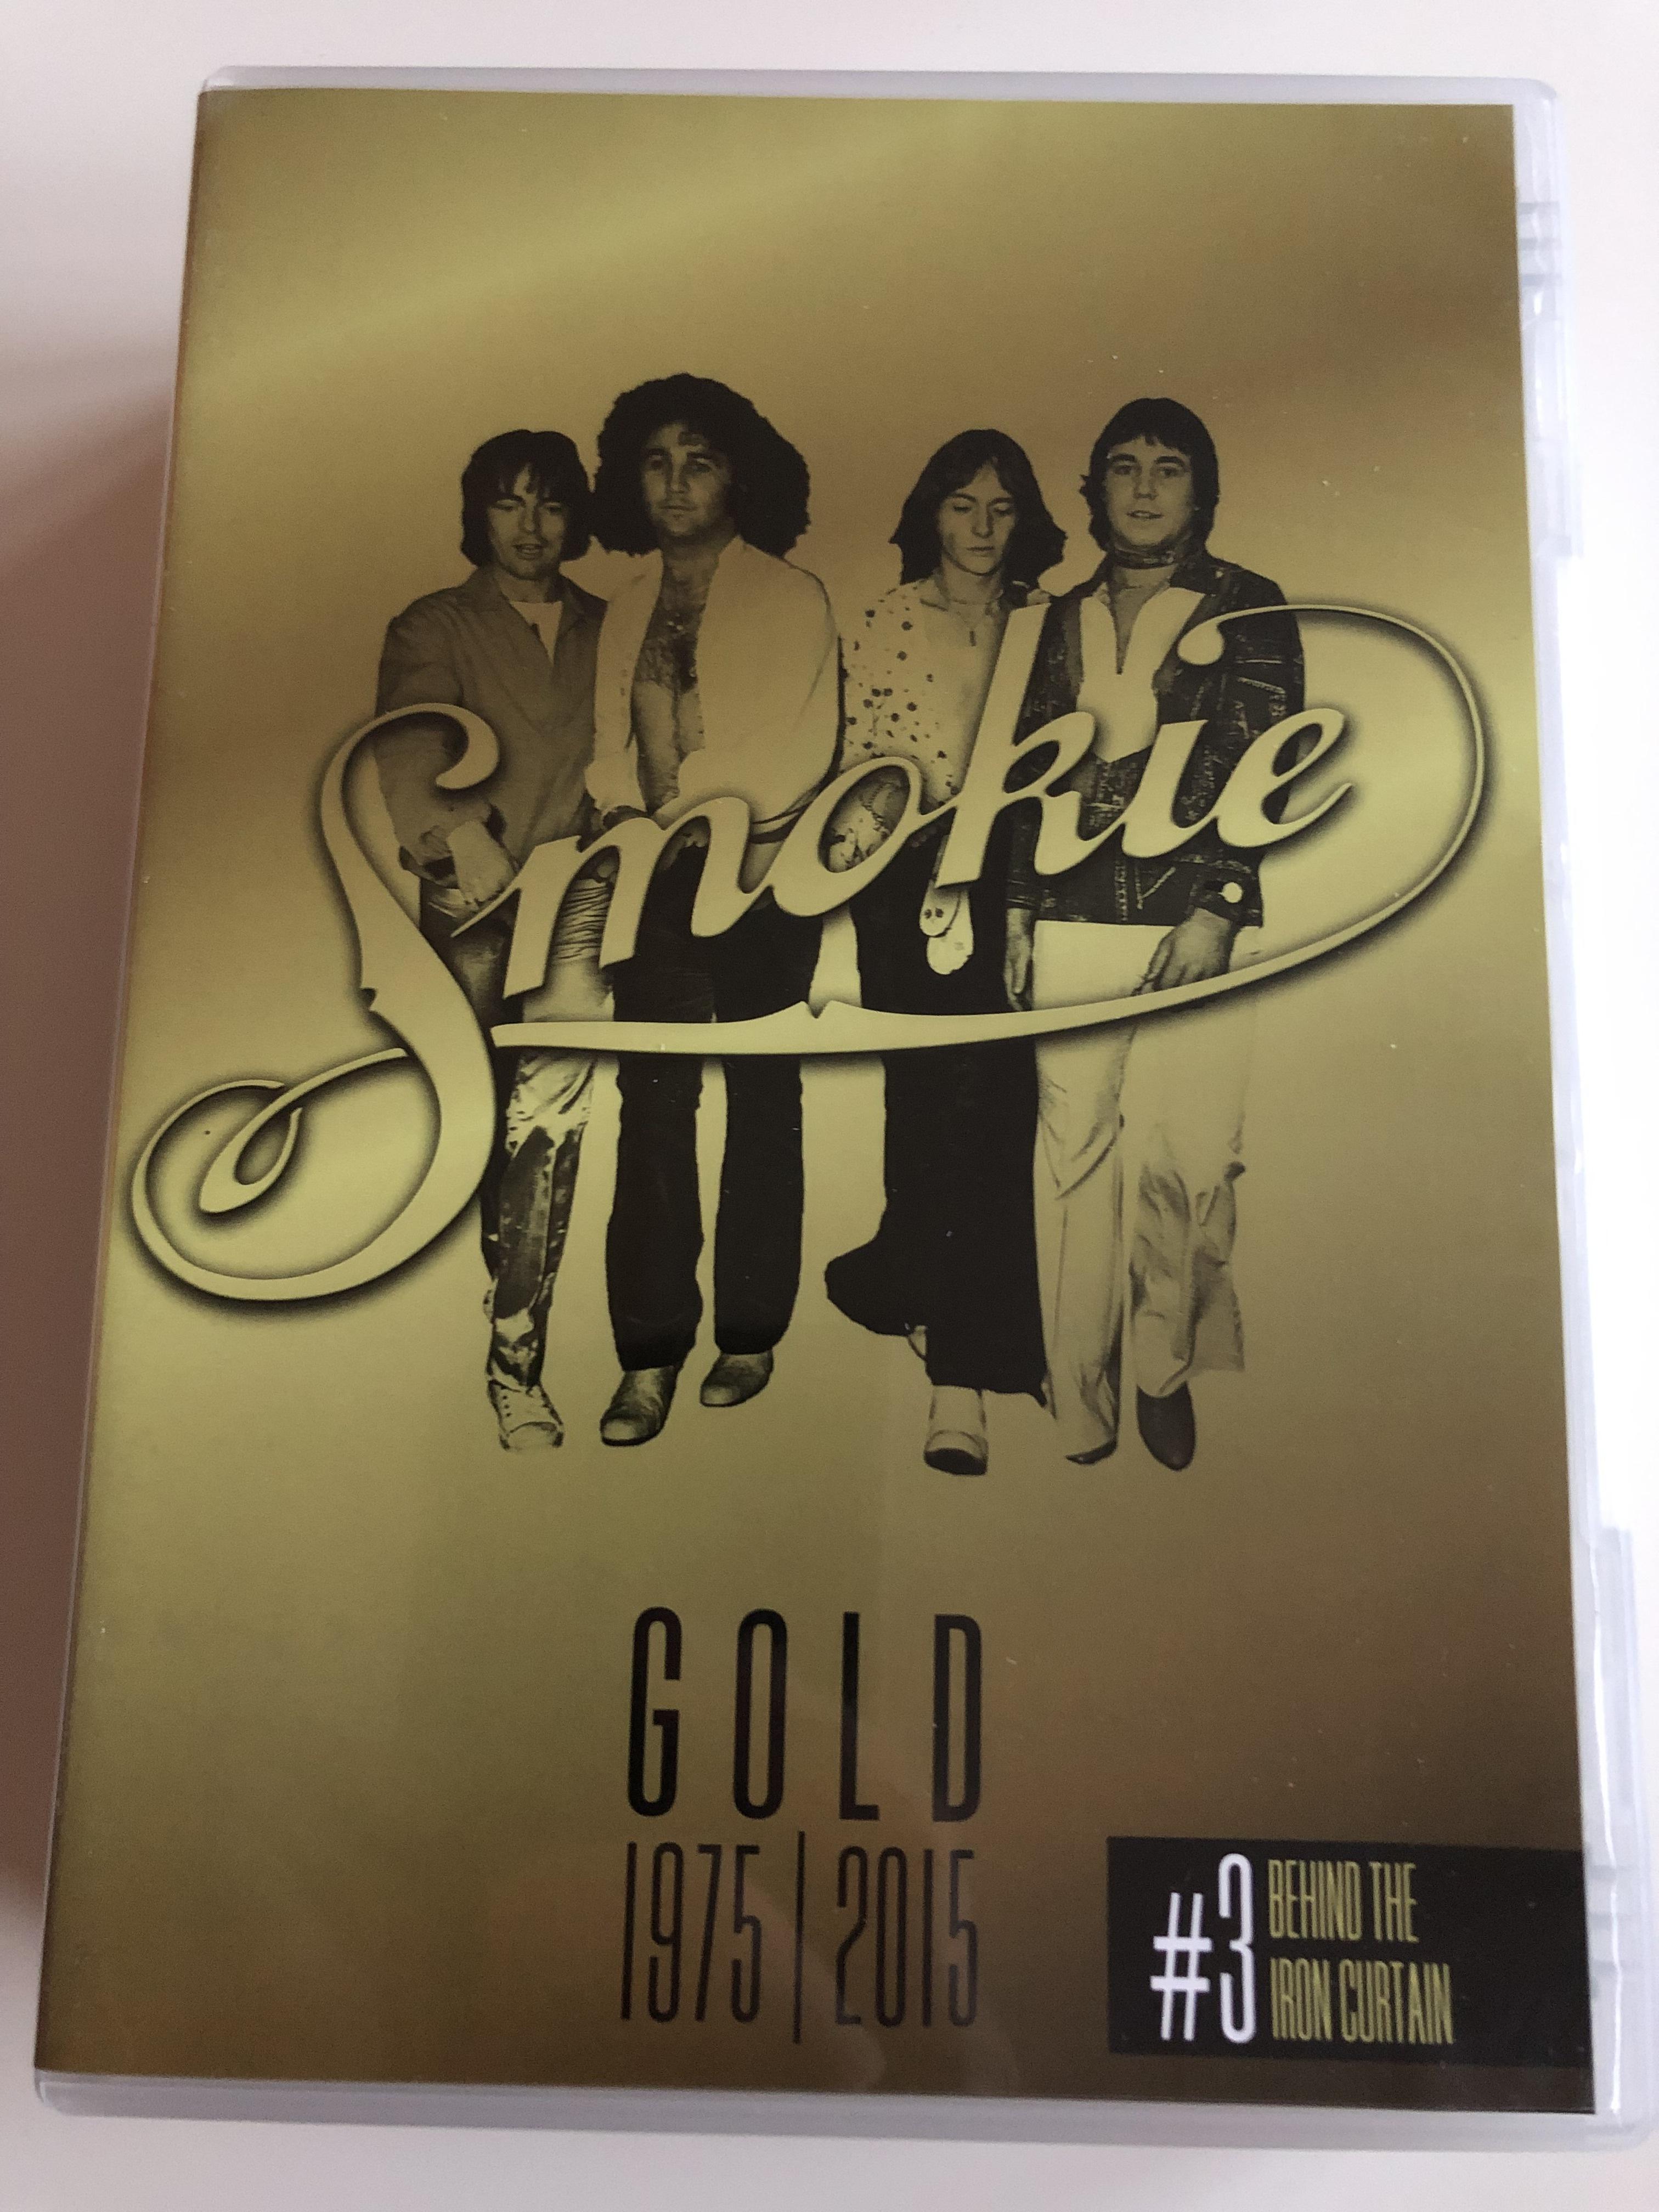 smokie-gold-1975-2015-dvd-3-40th-anniversary-edition-behind-the-iron-curtain-east-berlin-1976-sofia-1983-bratislava-1983-glitzerlicht-und-hinterh-fe-documentary-sony-music-1-.jpg